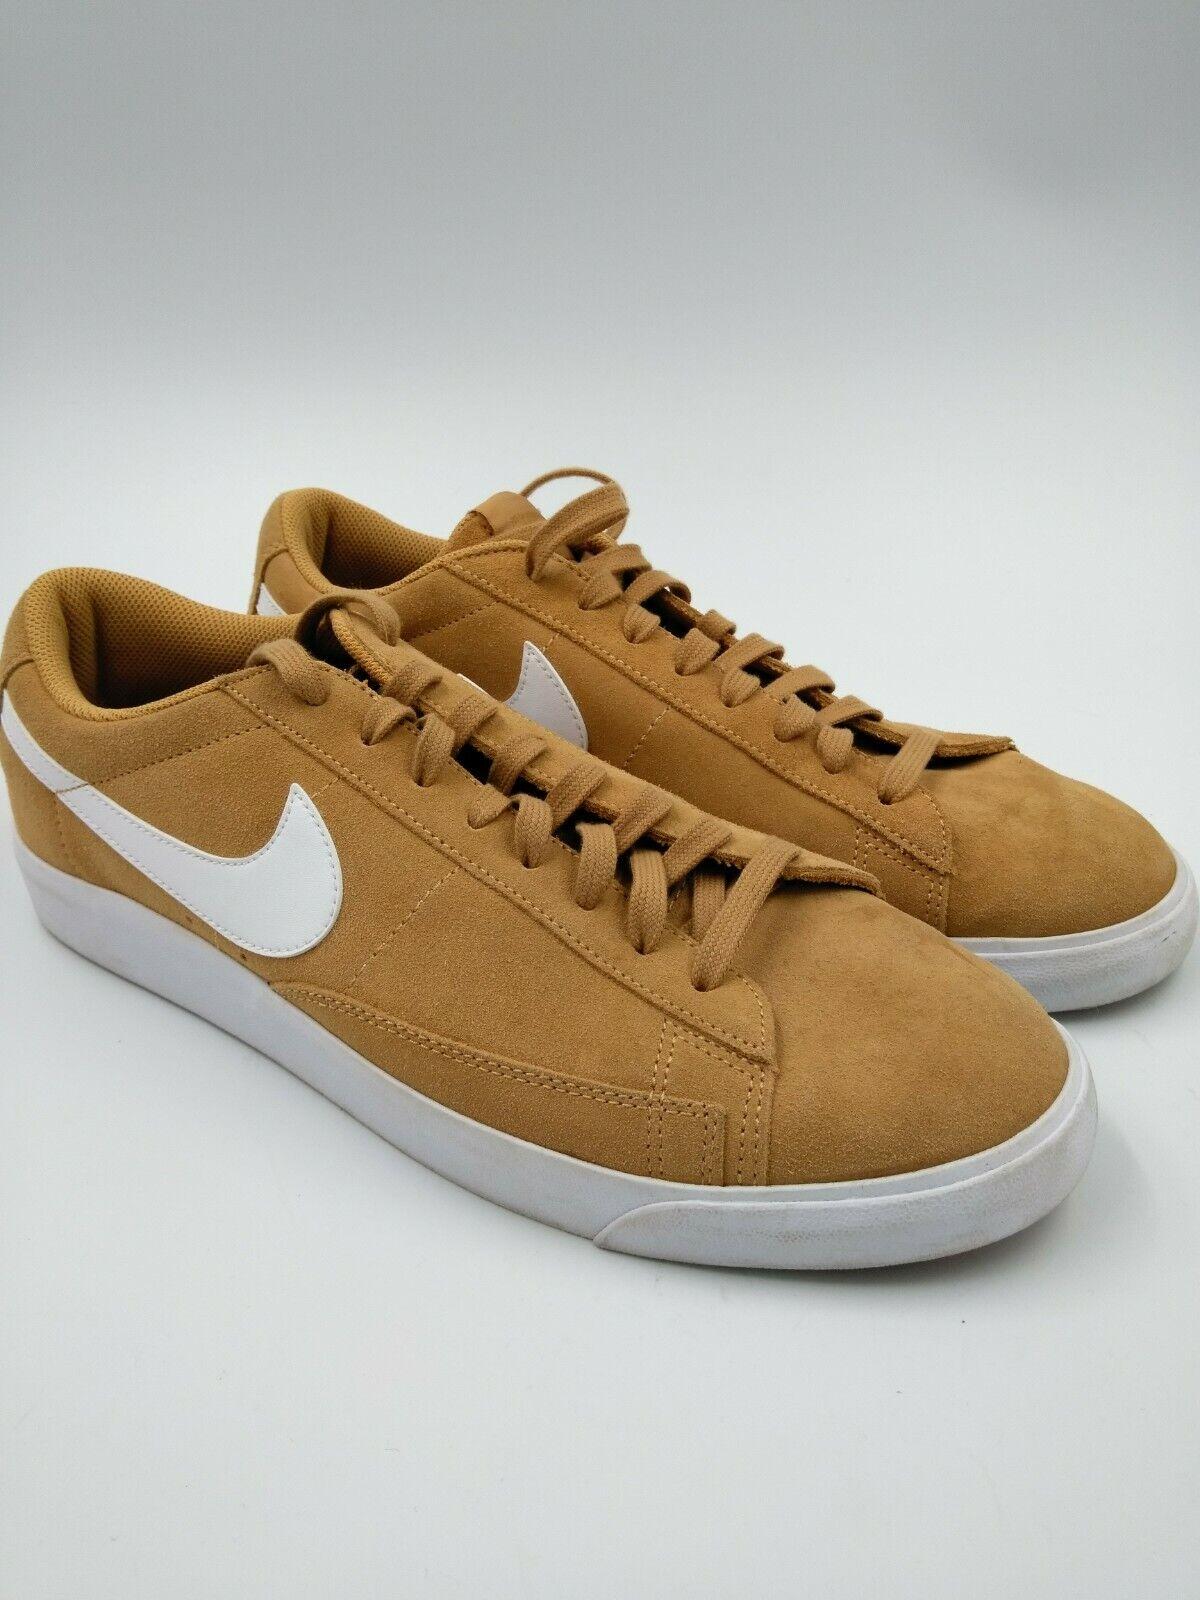 Nike Blazer Low -Top Sneeaker män mäne Sne5533;65533;s Storlek 11.5 11.5 11.5 Elemäntal guld mocka sko  E-handel